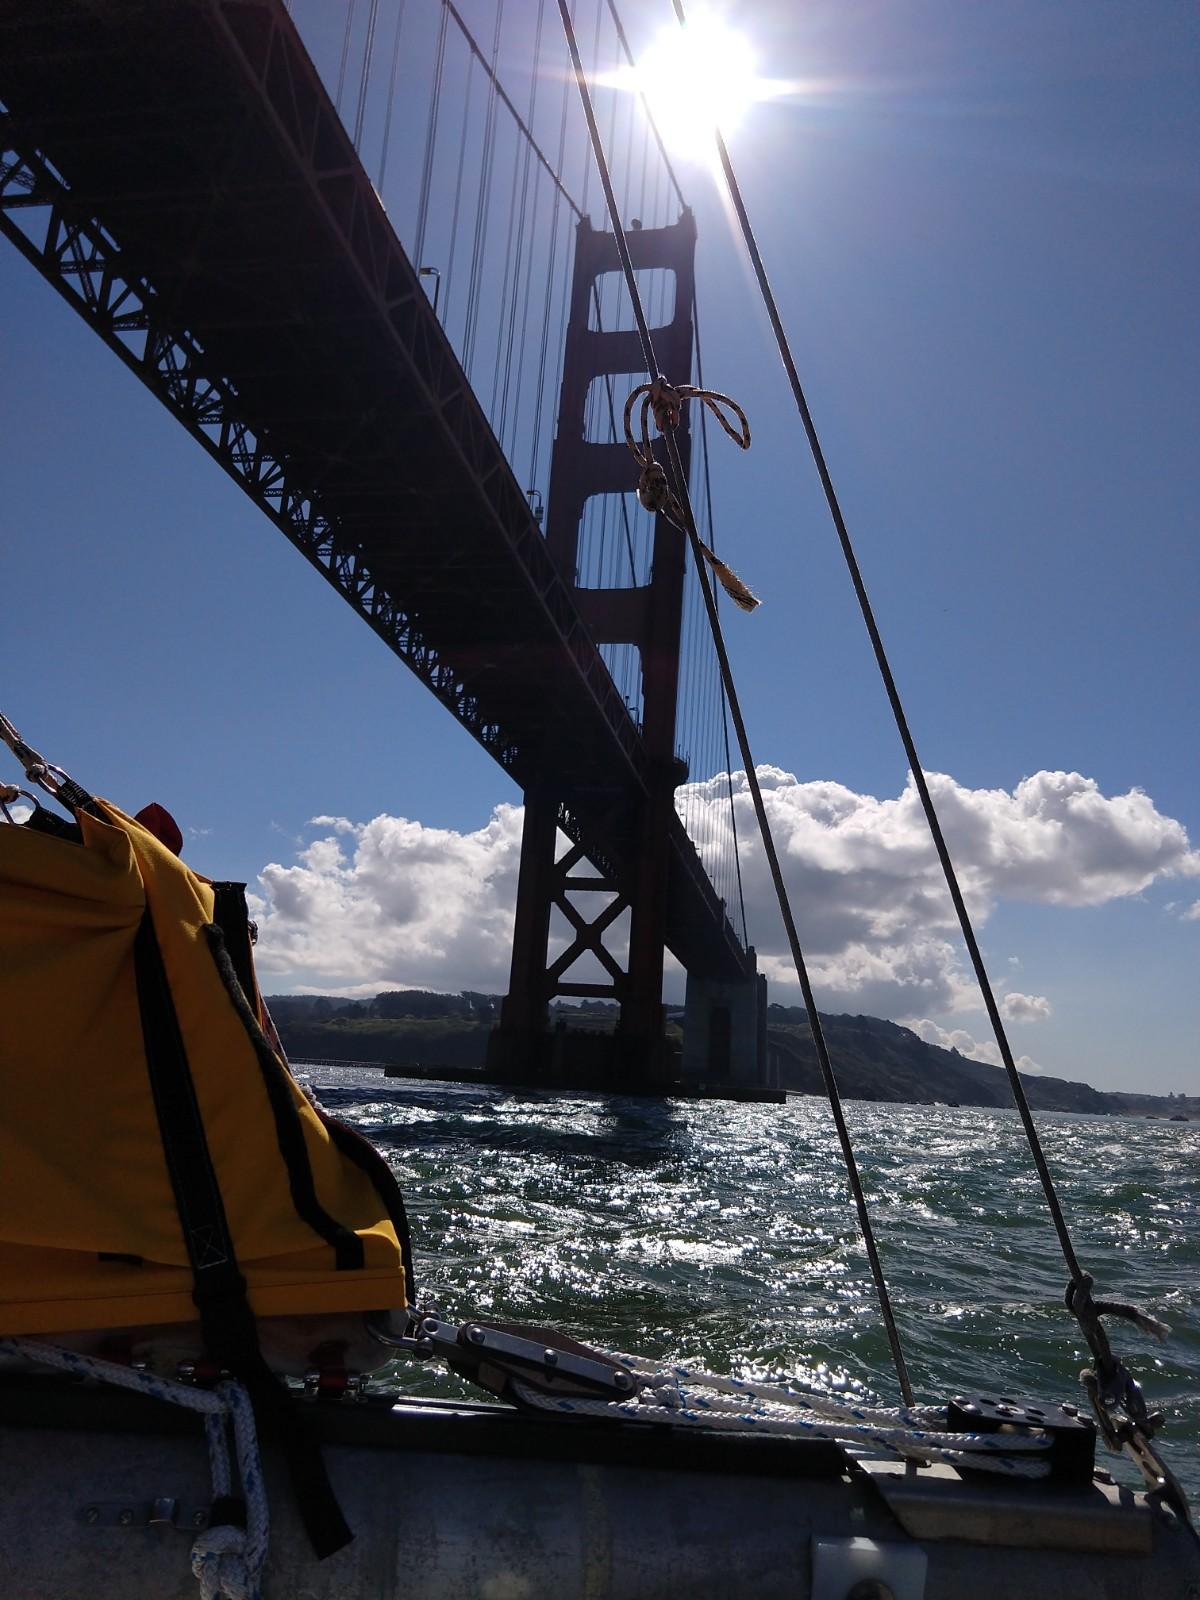 Golden Gate Bridge from the underside